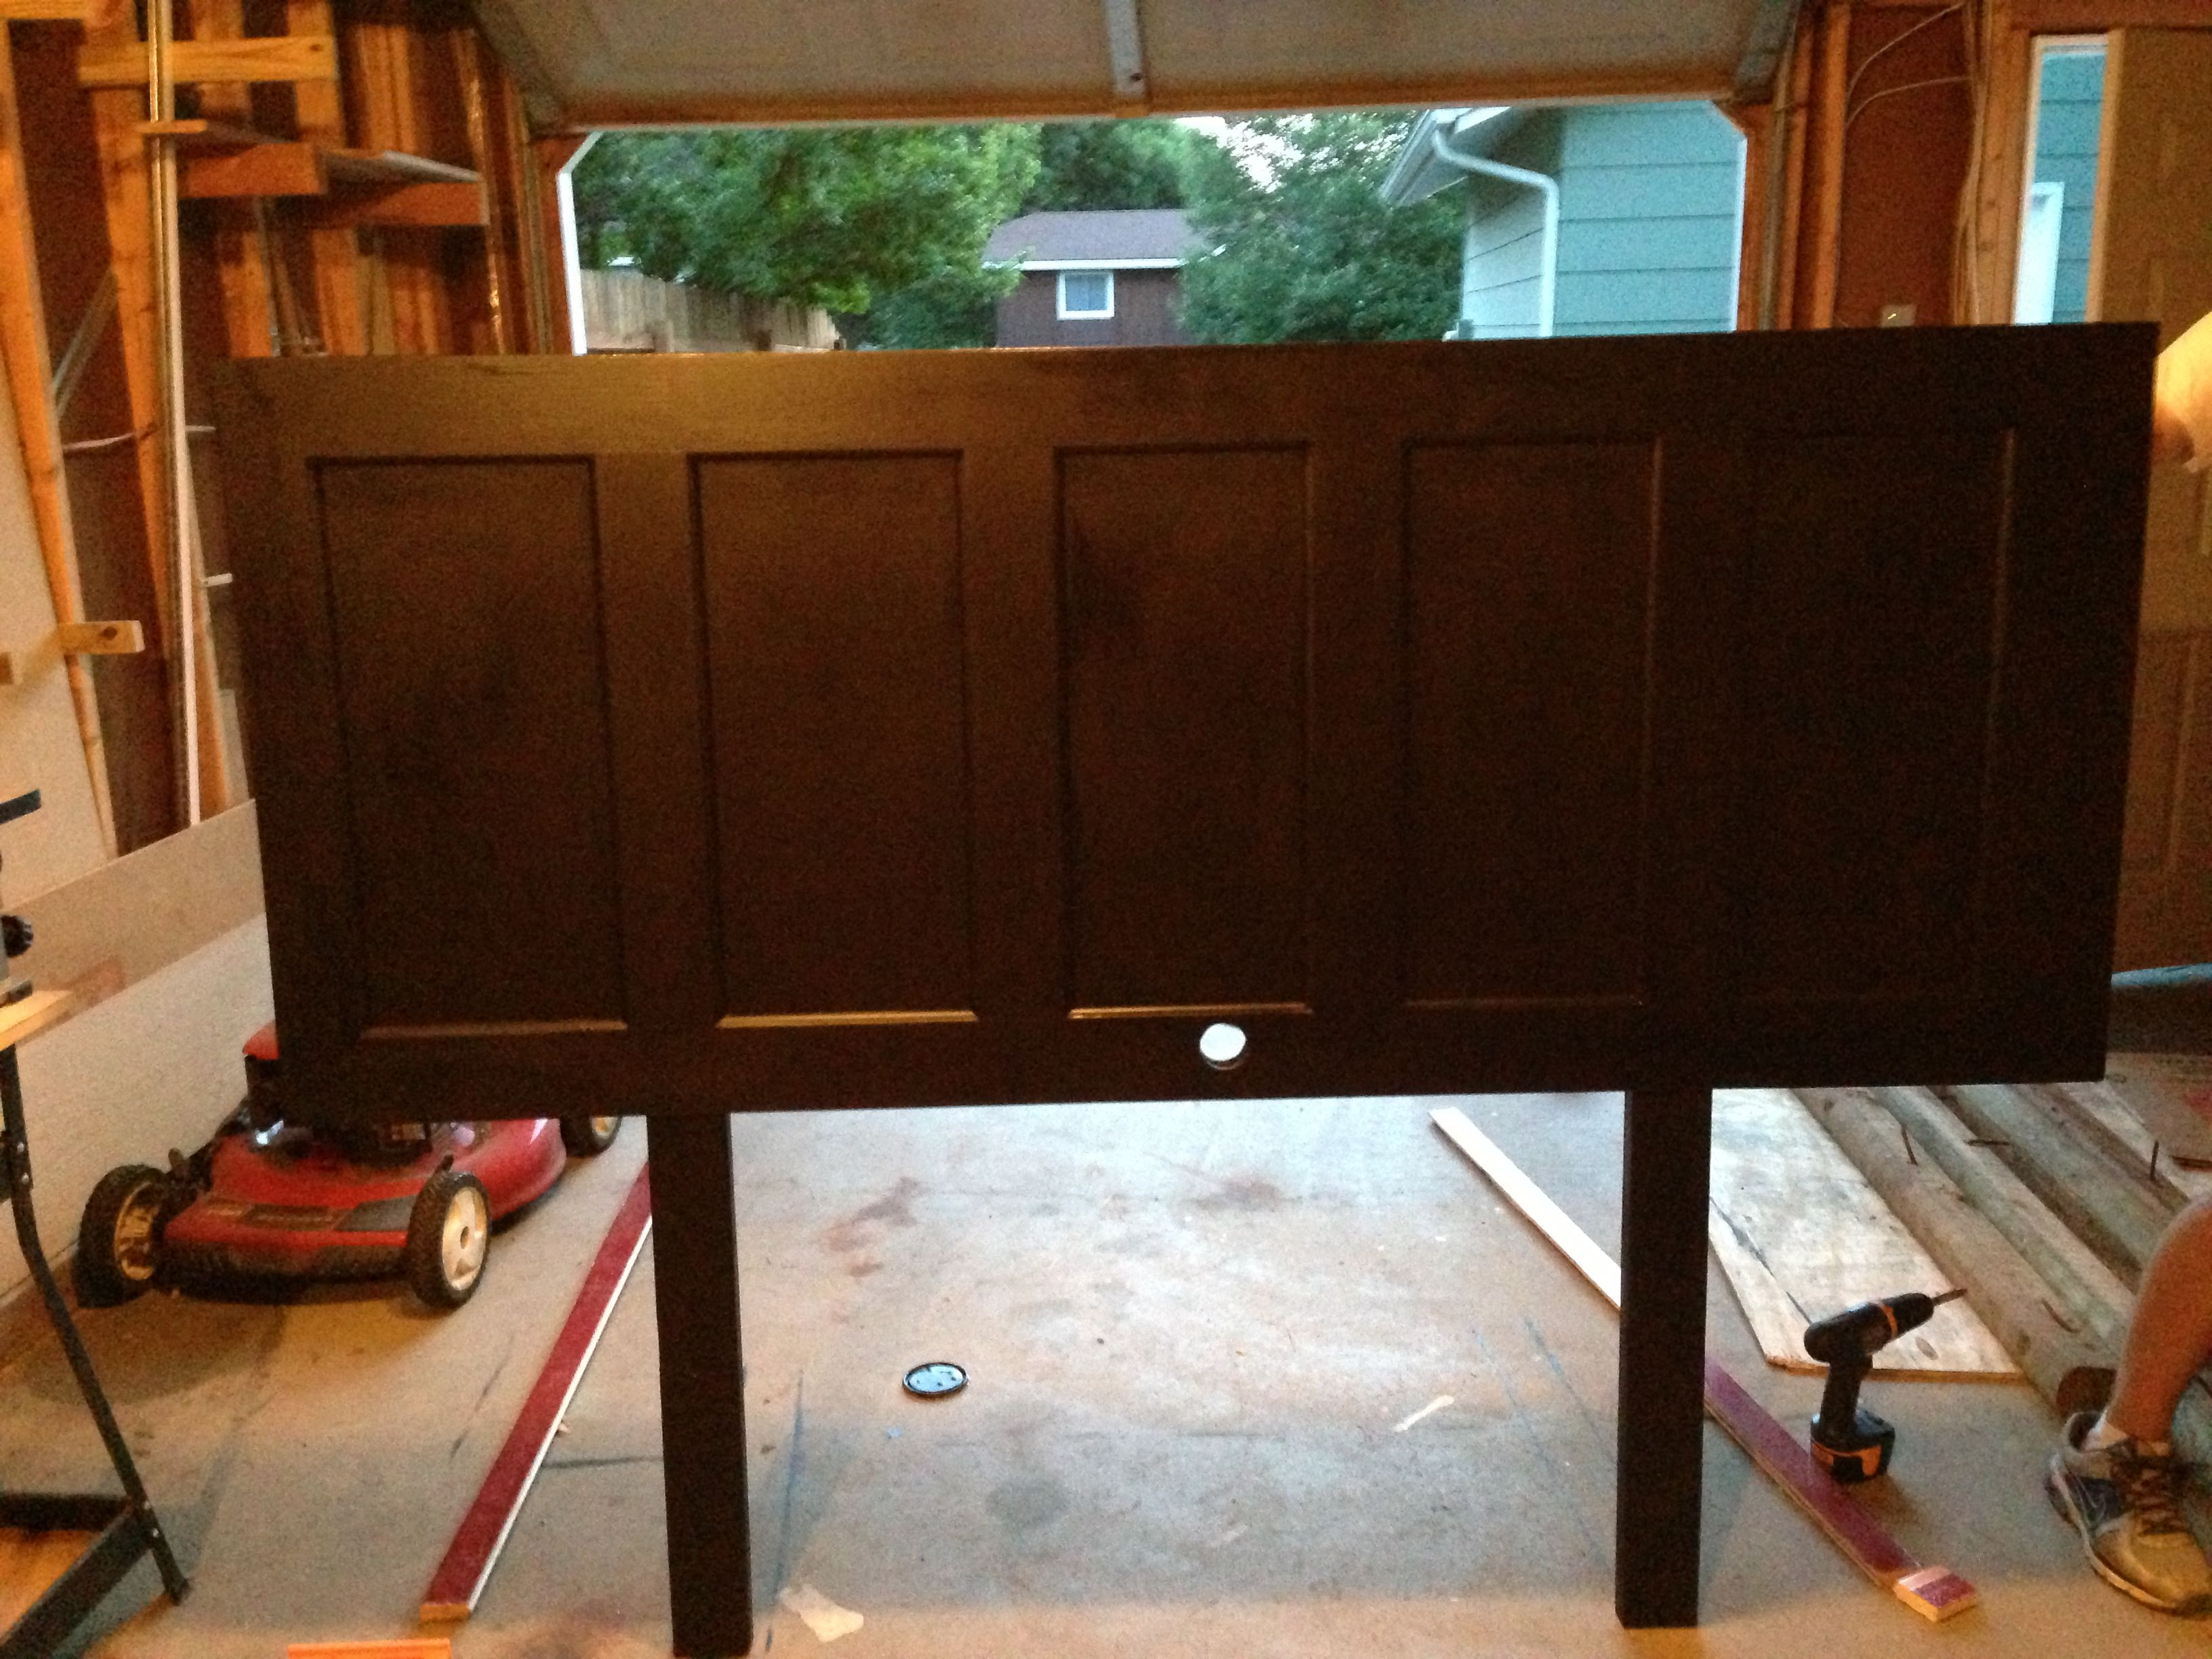 Diy headboard made from old door crafts pinterest diy